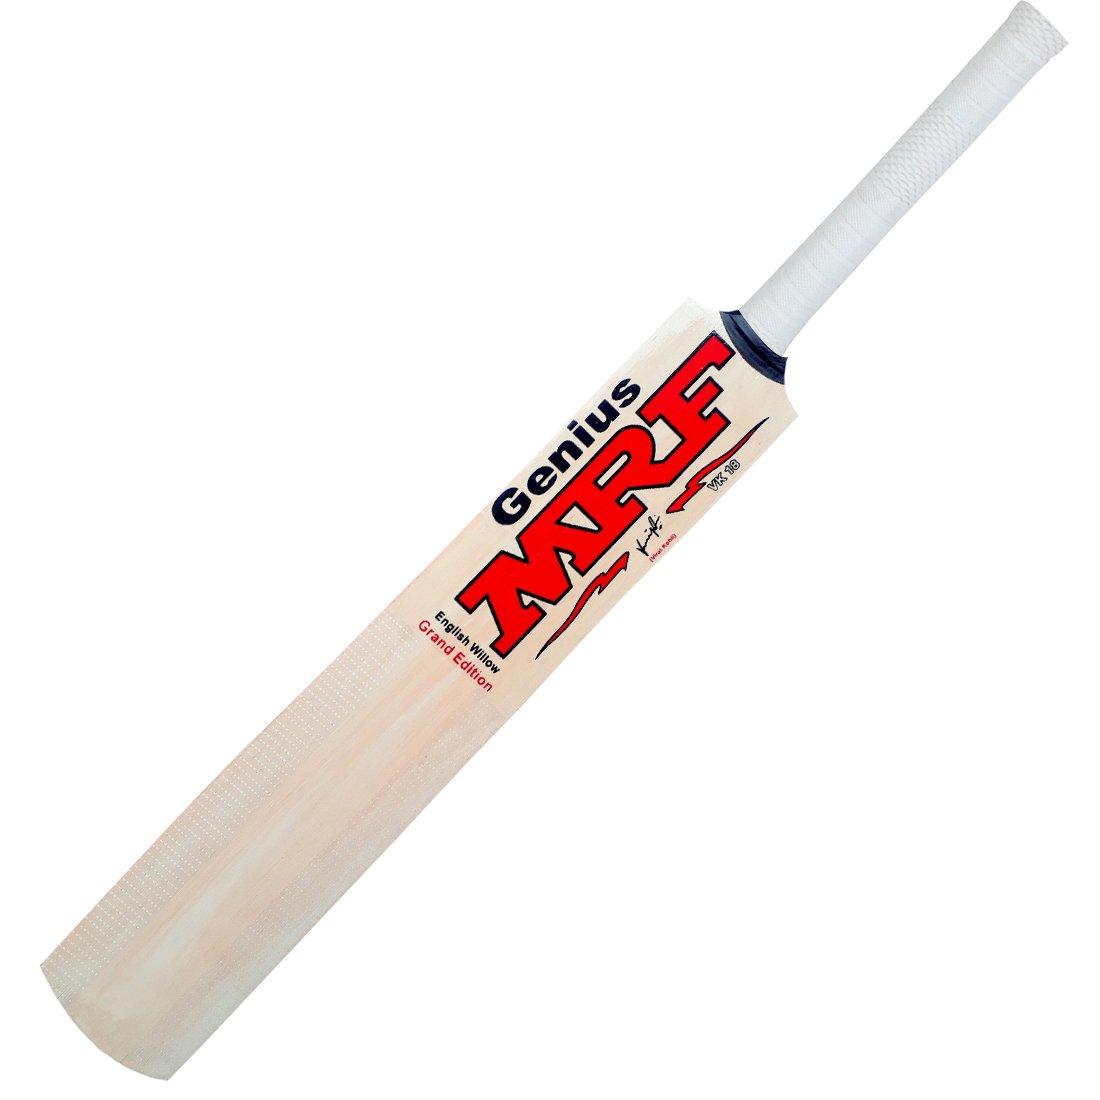 MRF Genius Virat Kohli English Willow Cricket Bat